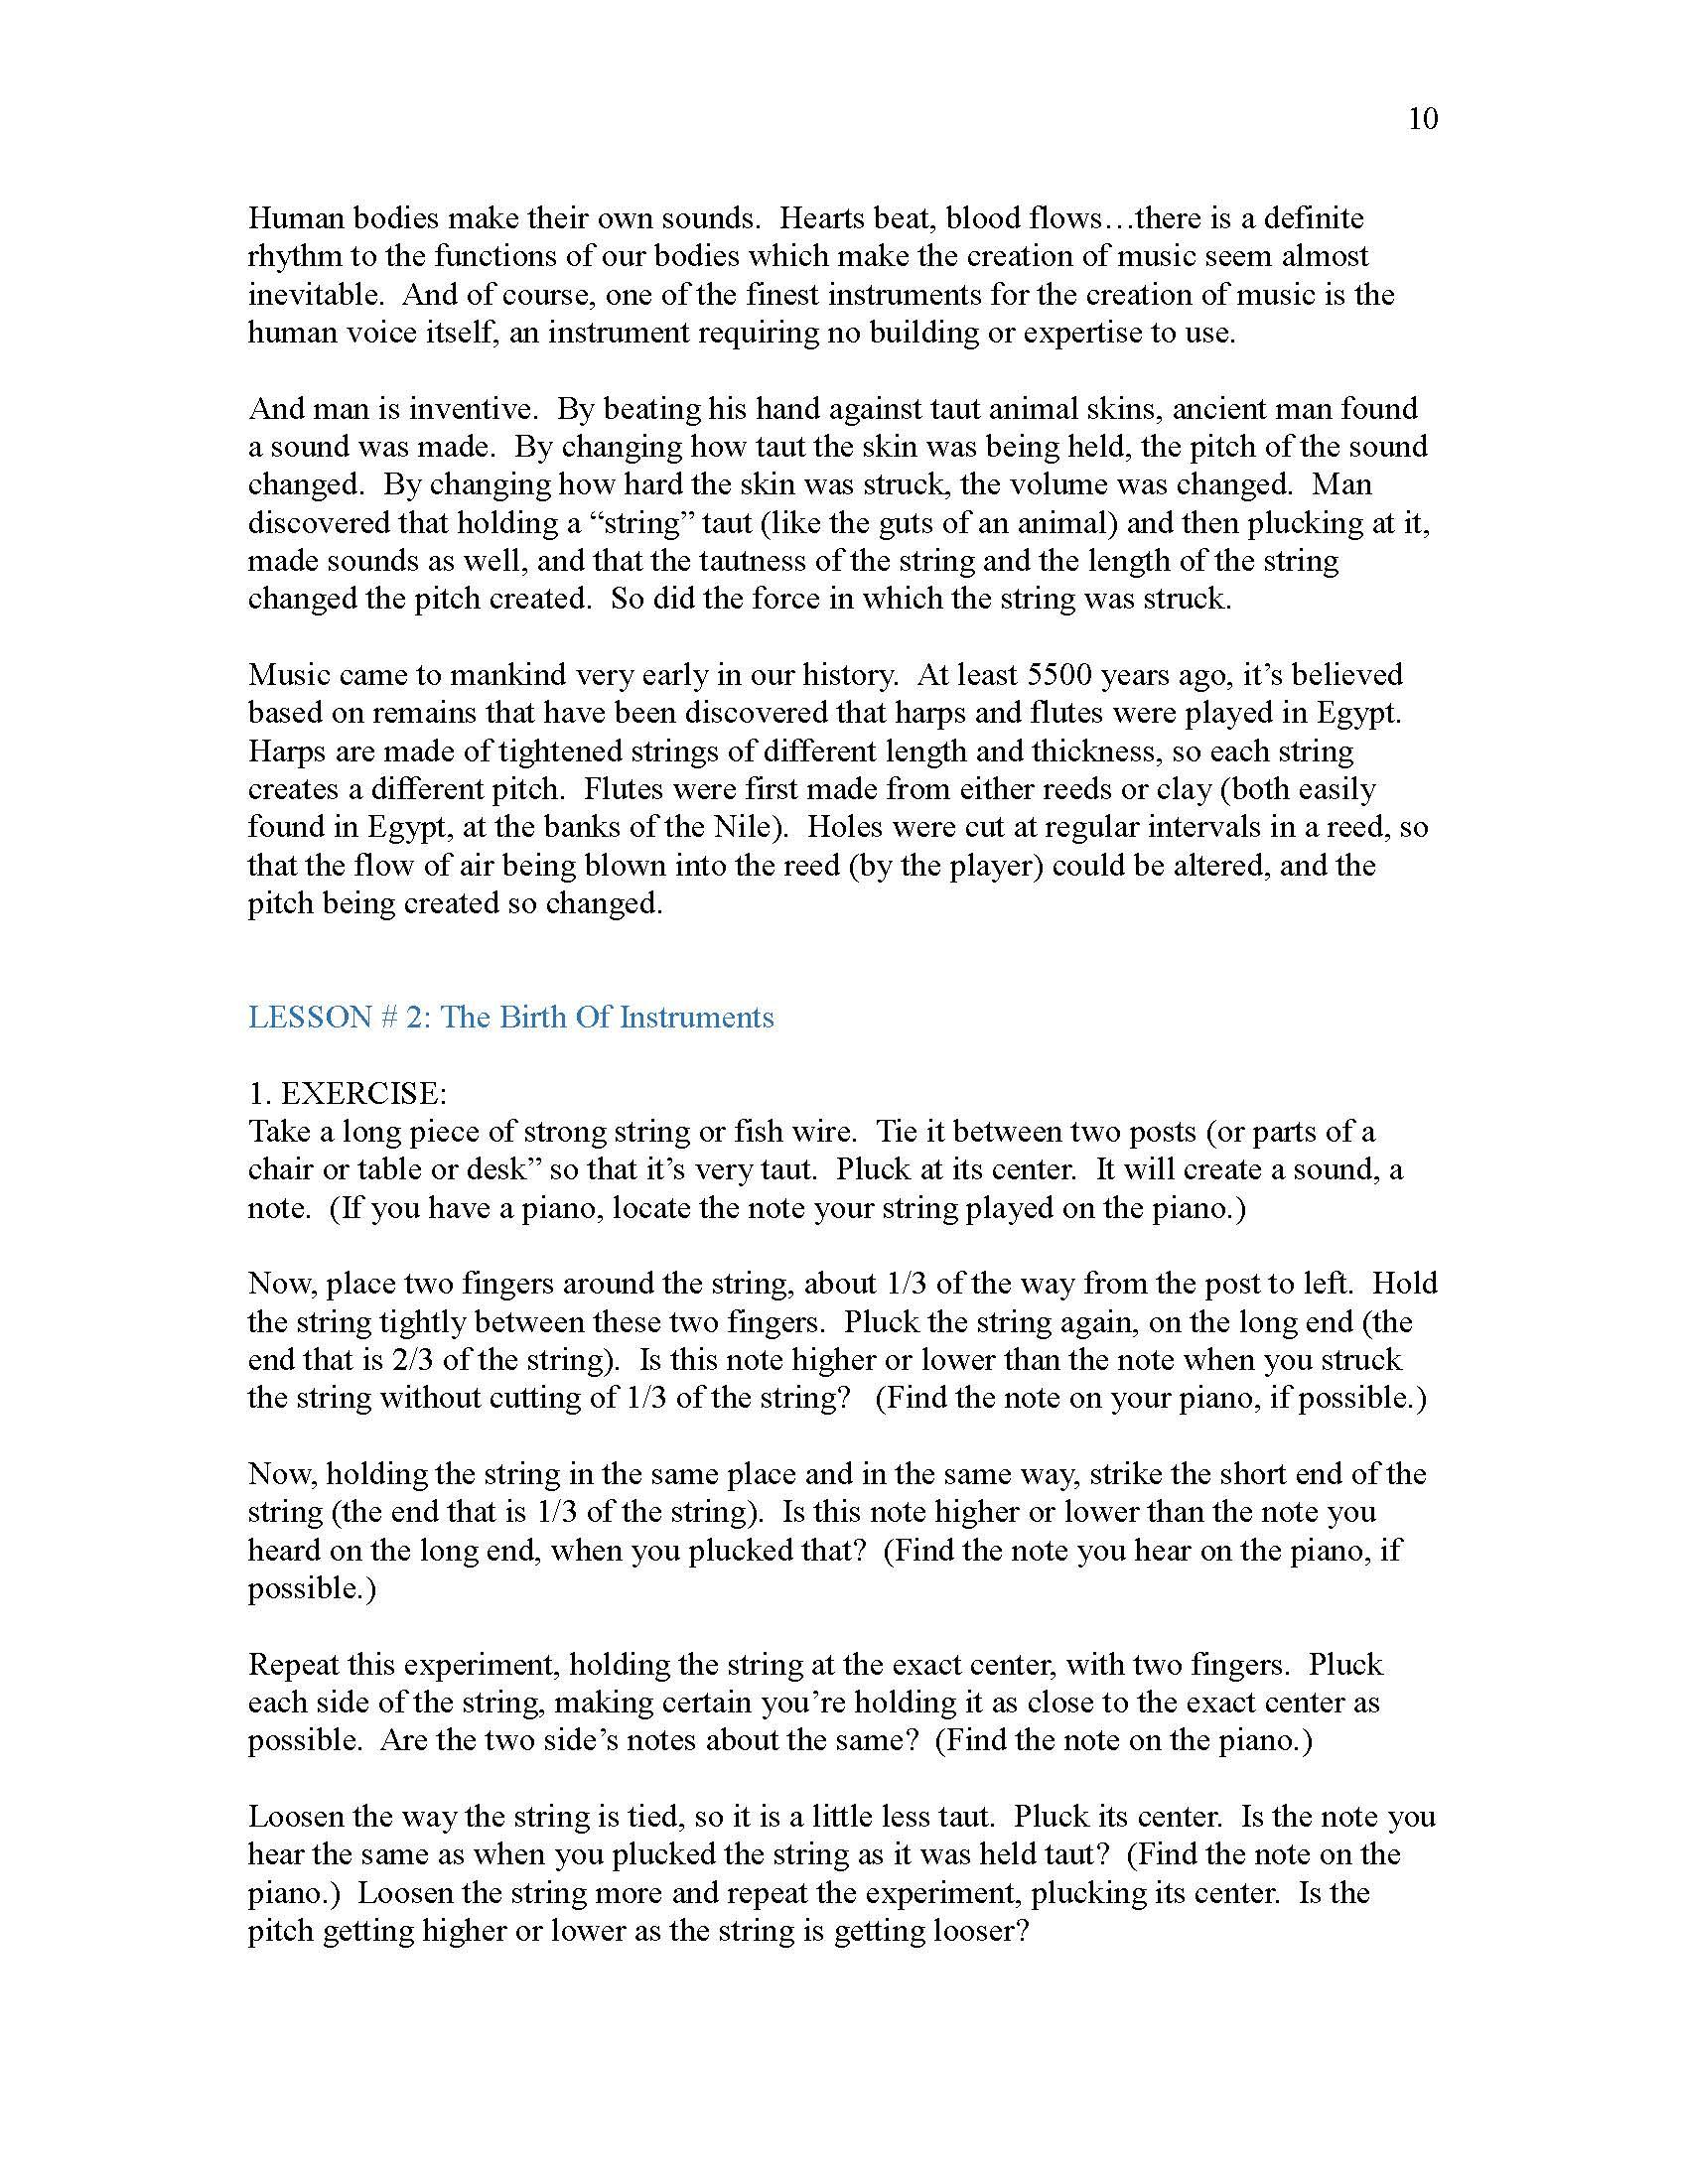 STEP 3-4 - Music Theory 3 - Basic Music History_Page_011.jpg